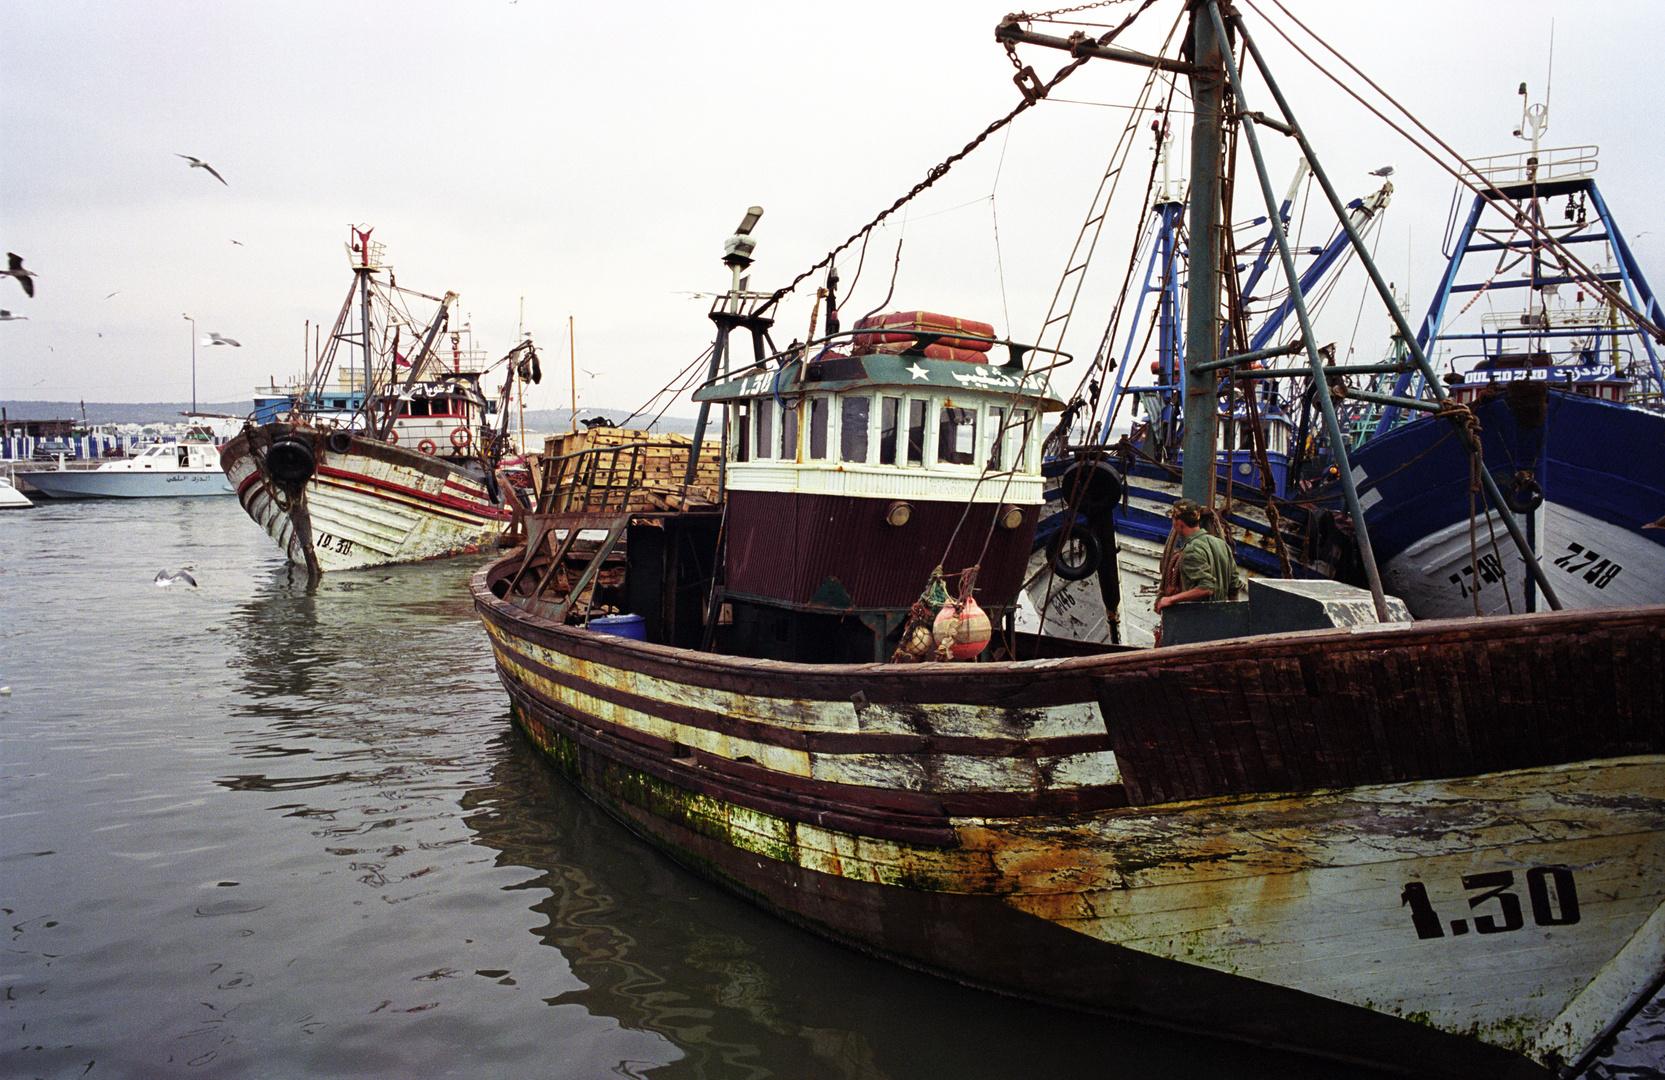 1080_Fishing Boat_Essaouira_CM_di.jpg